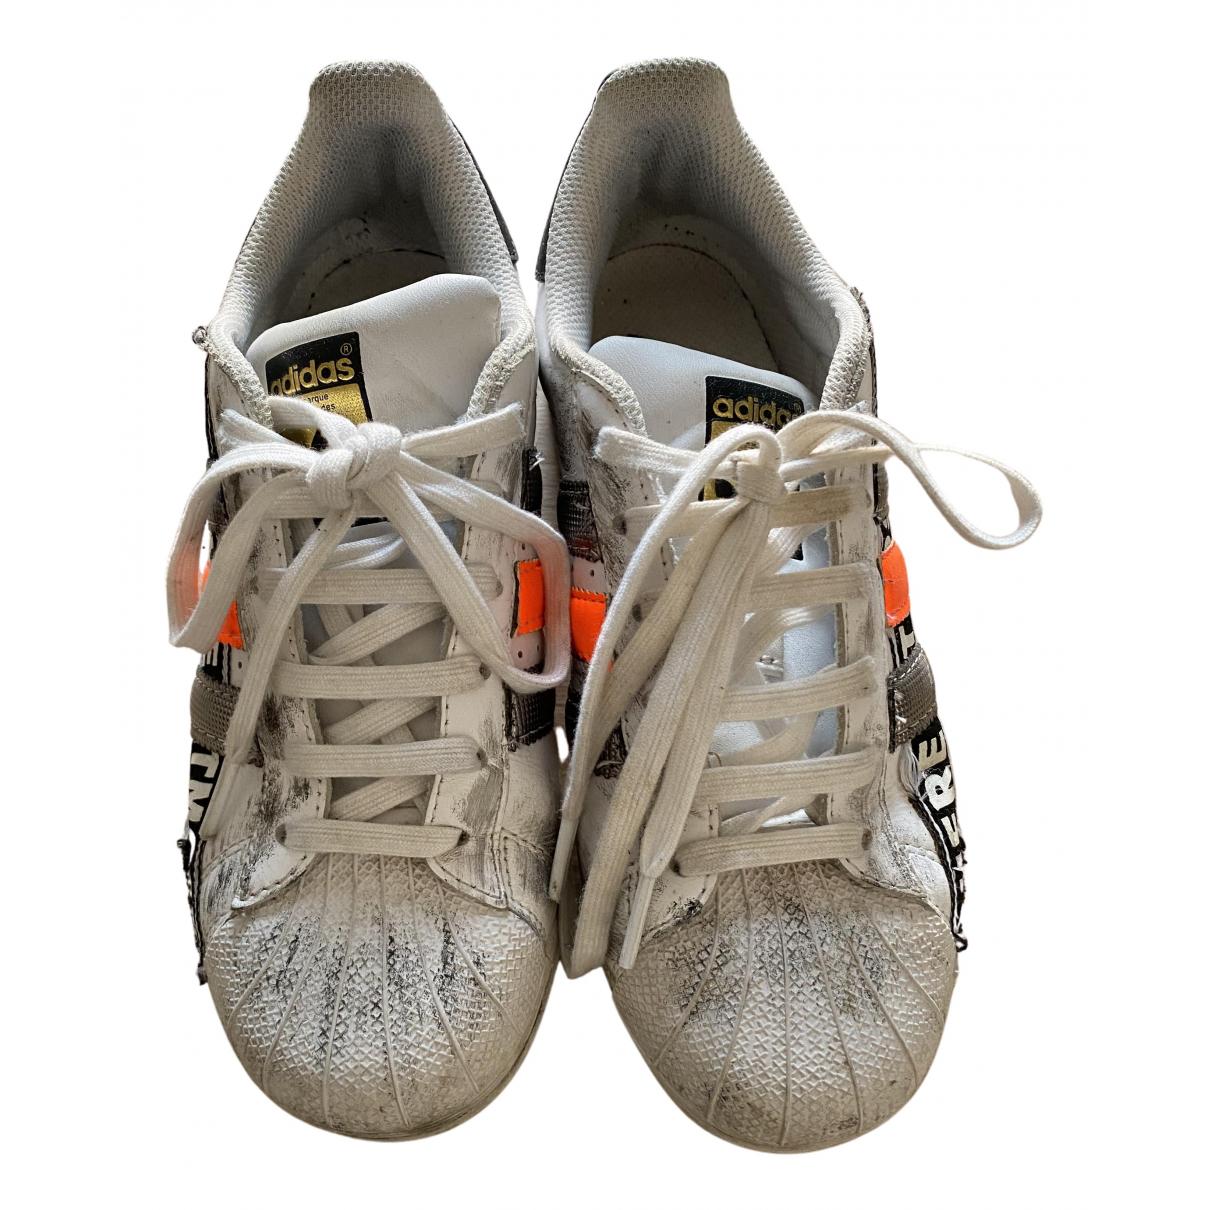 Adidas Superstar Sneakers in  Weiss Kautschuk